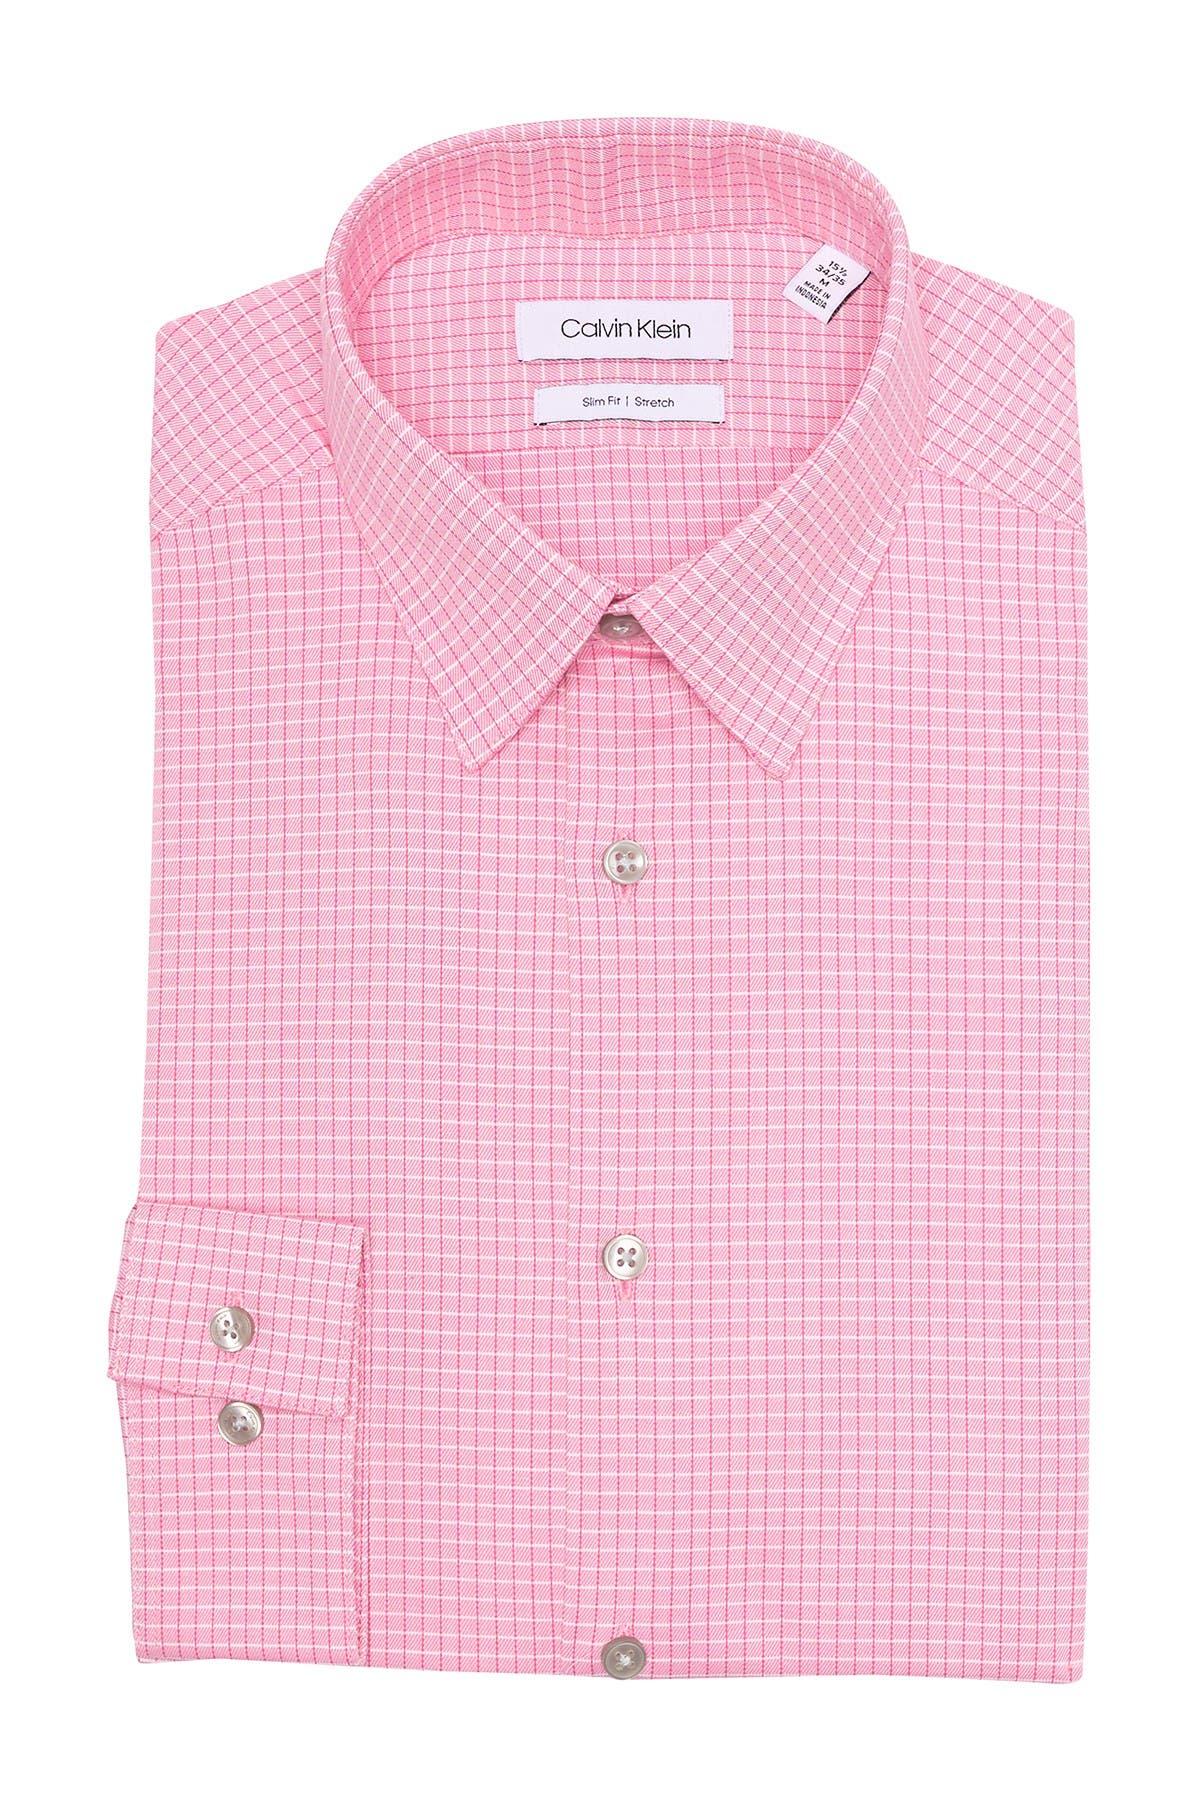 Image of Calvin Klein Windowpane Print Stretch Slim Fit Dress Shirt